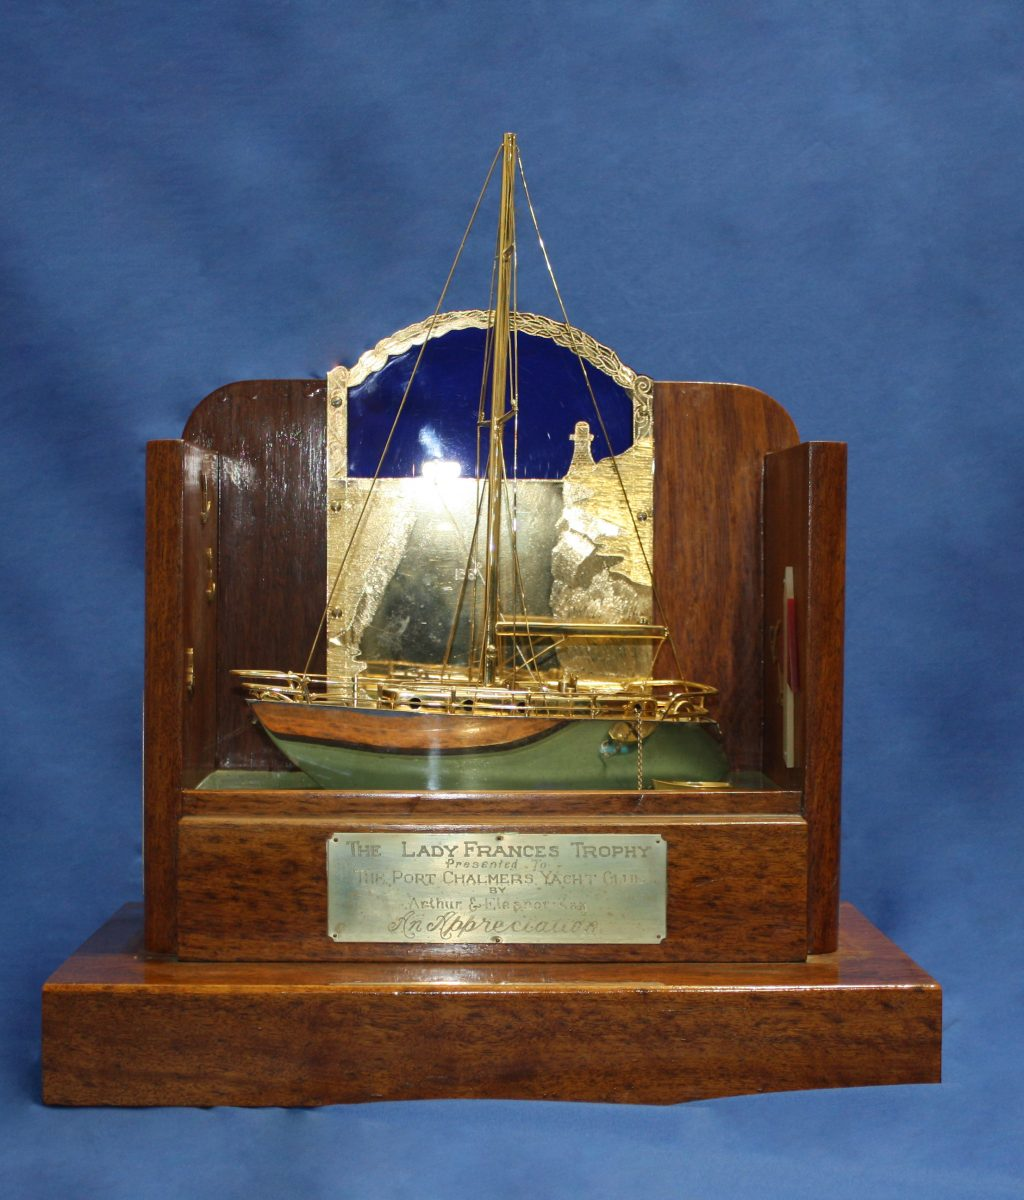 Lady Frances Trophy